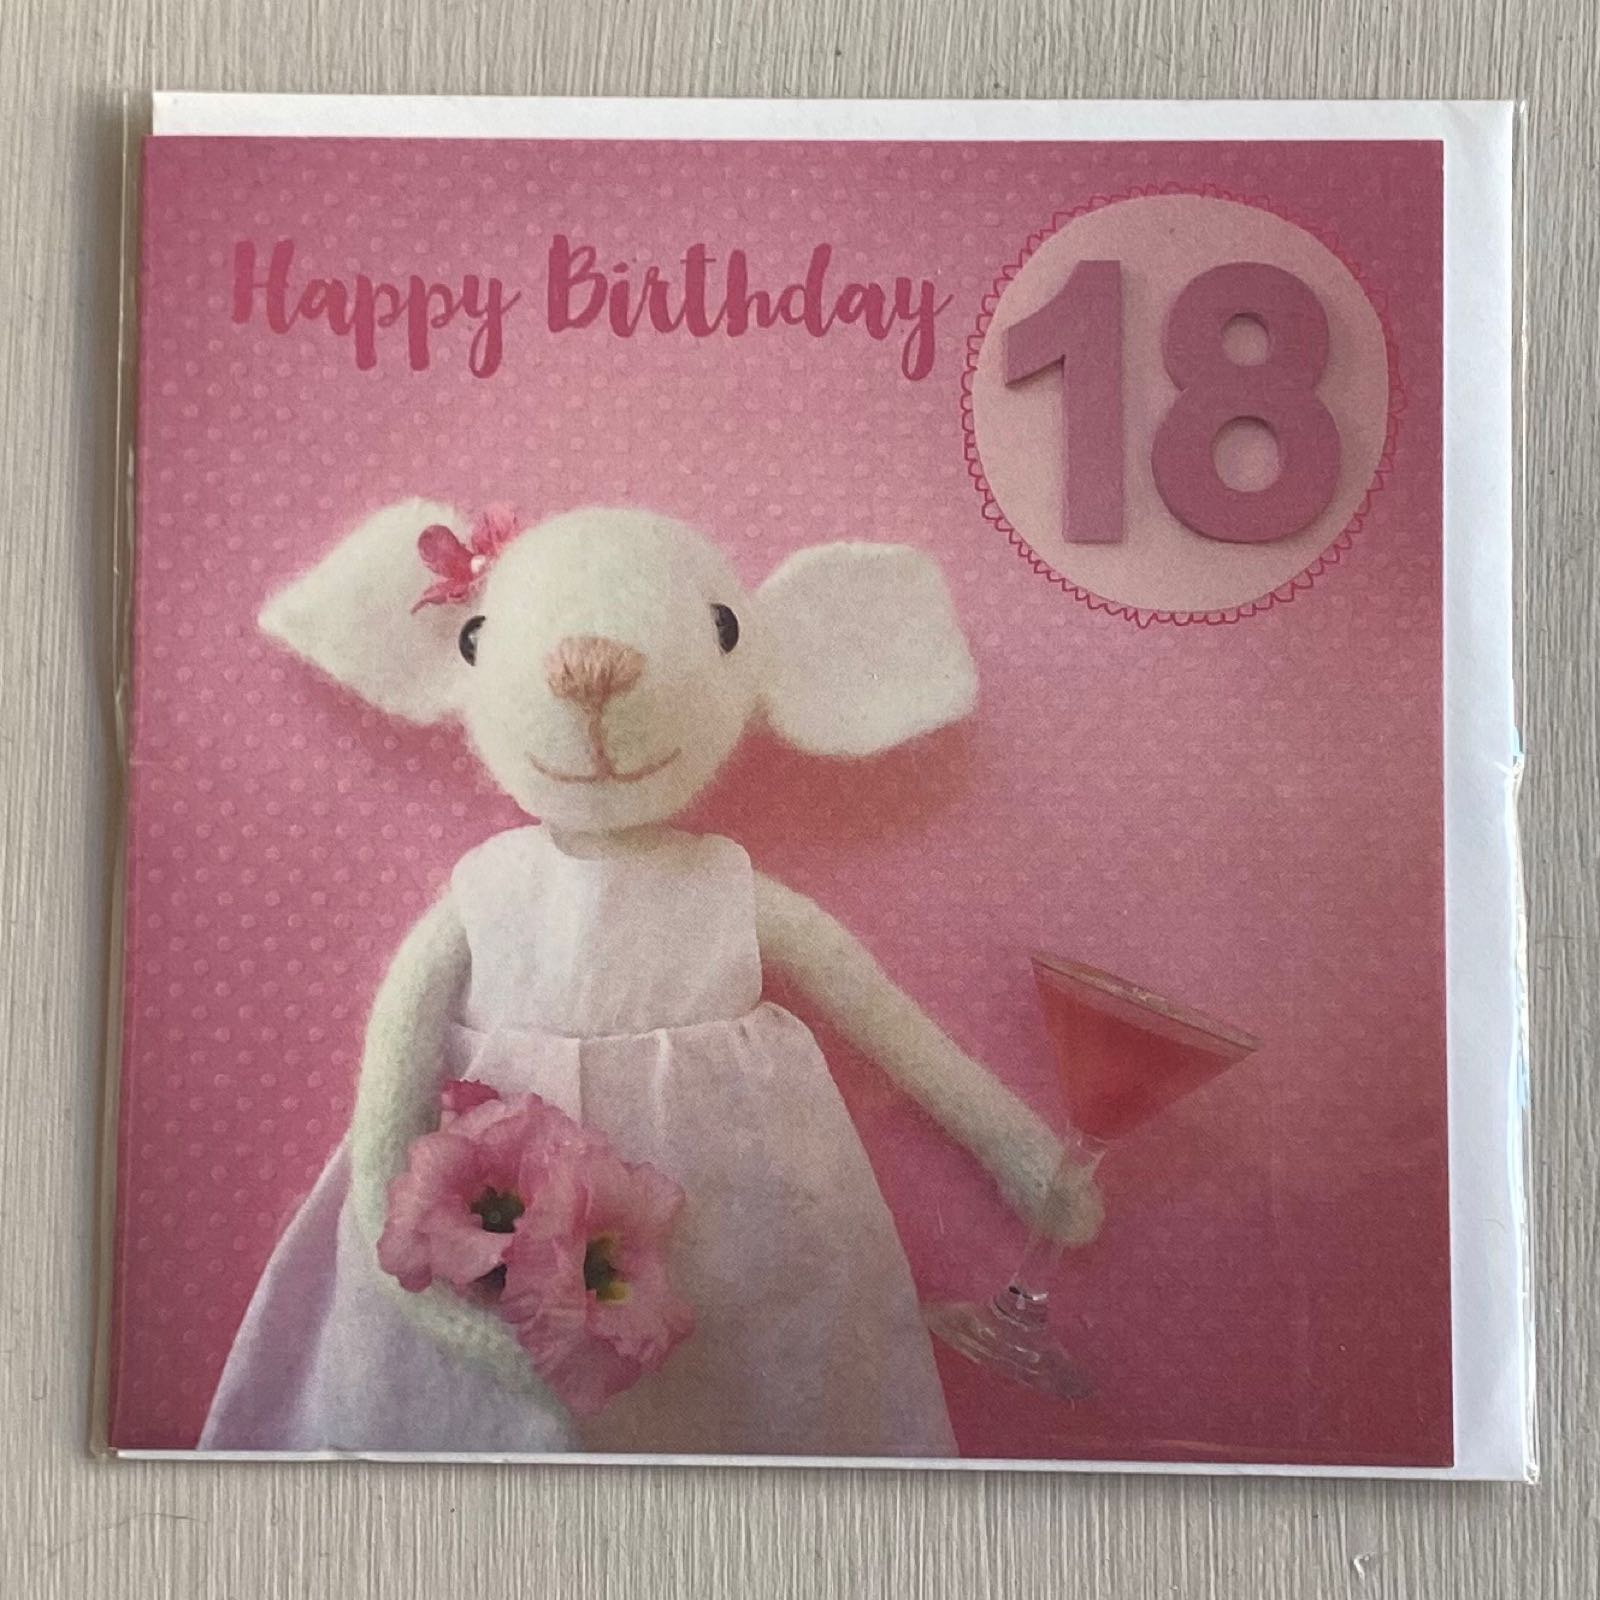 '18th Birthday' Pippi & Me Card